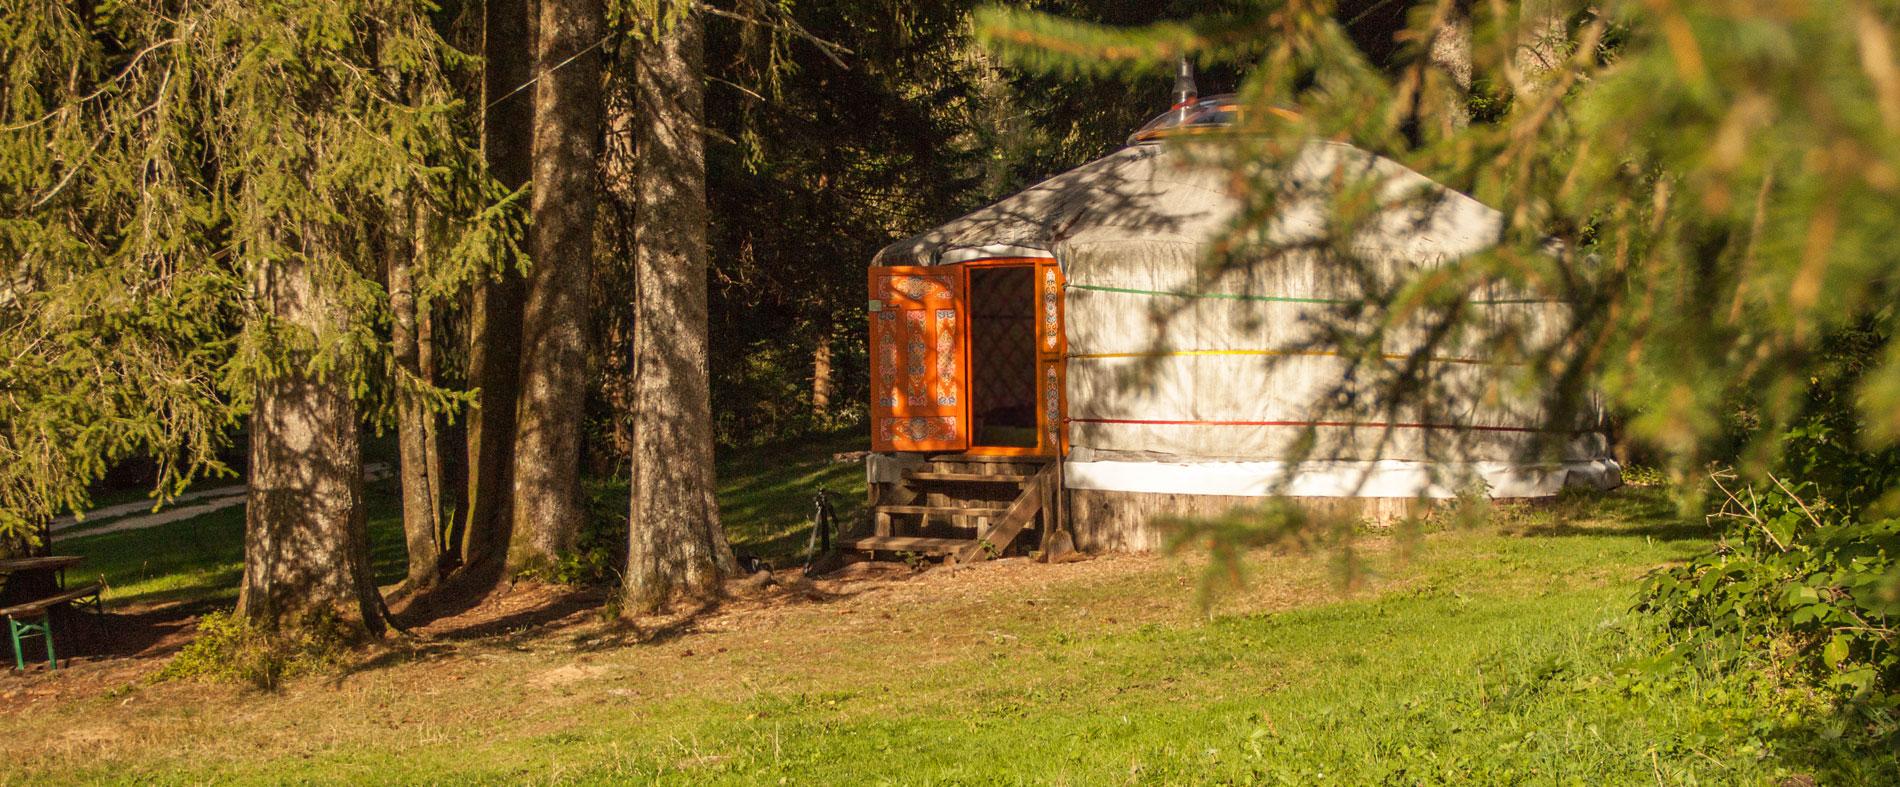 lightbox-camping-saignelegier-yourt1